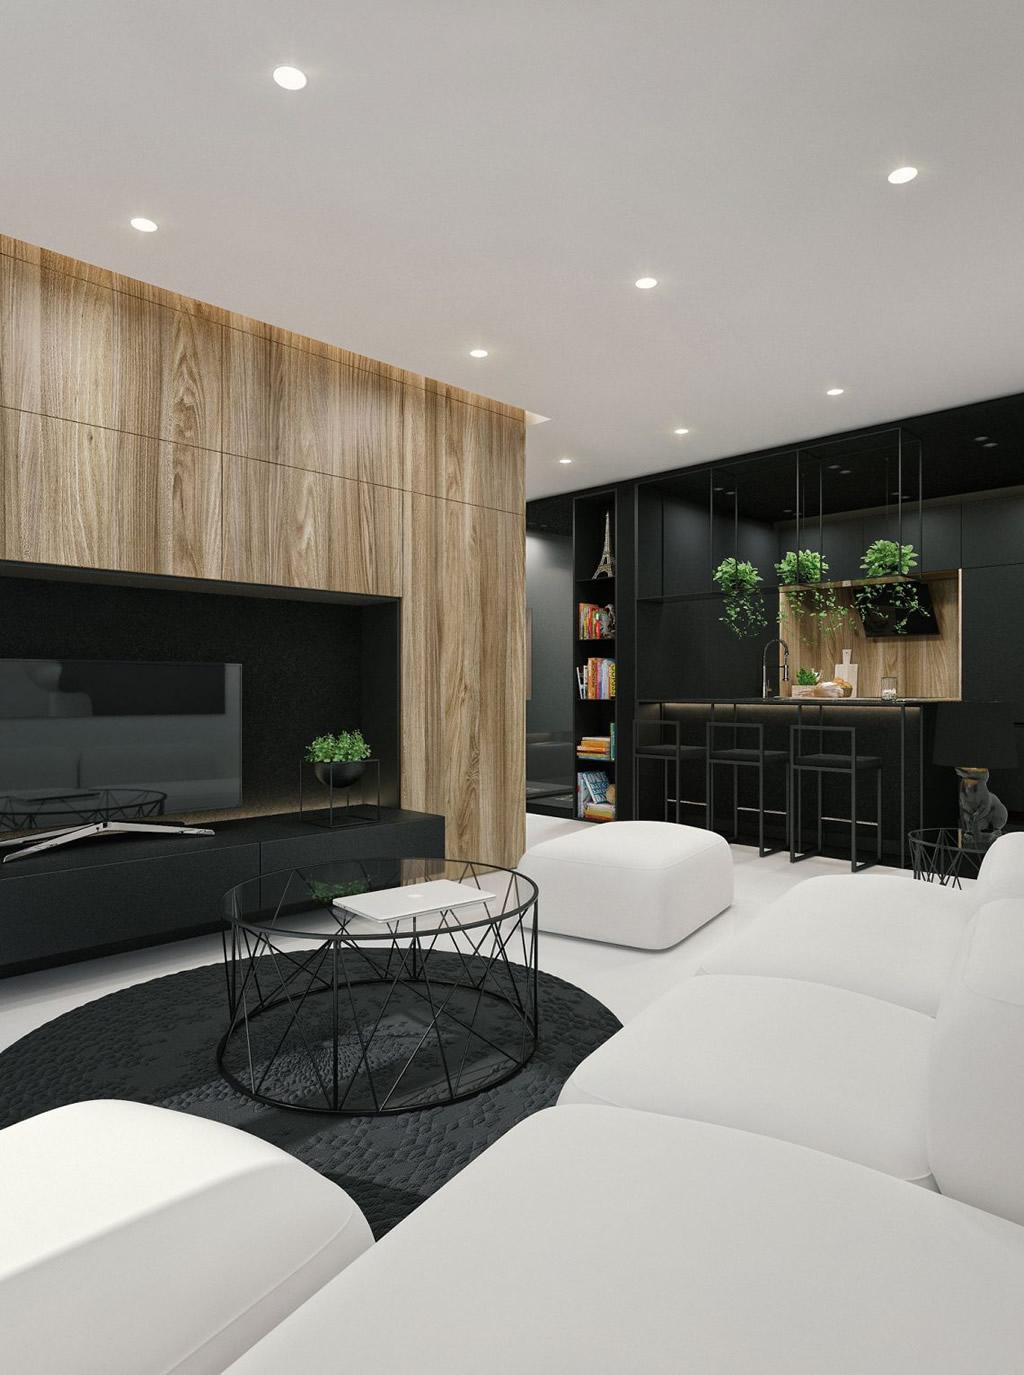 Cozy Modern Apartment In Kaunas, Lithuania 6